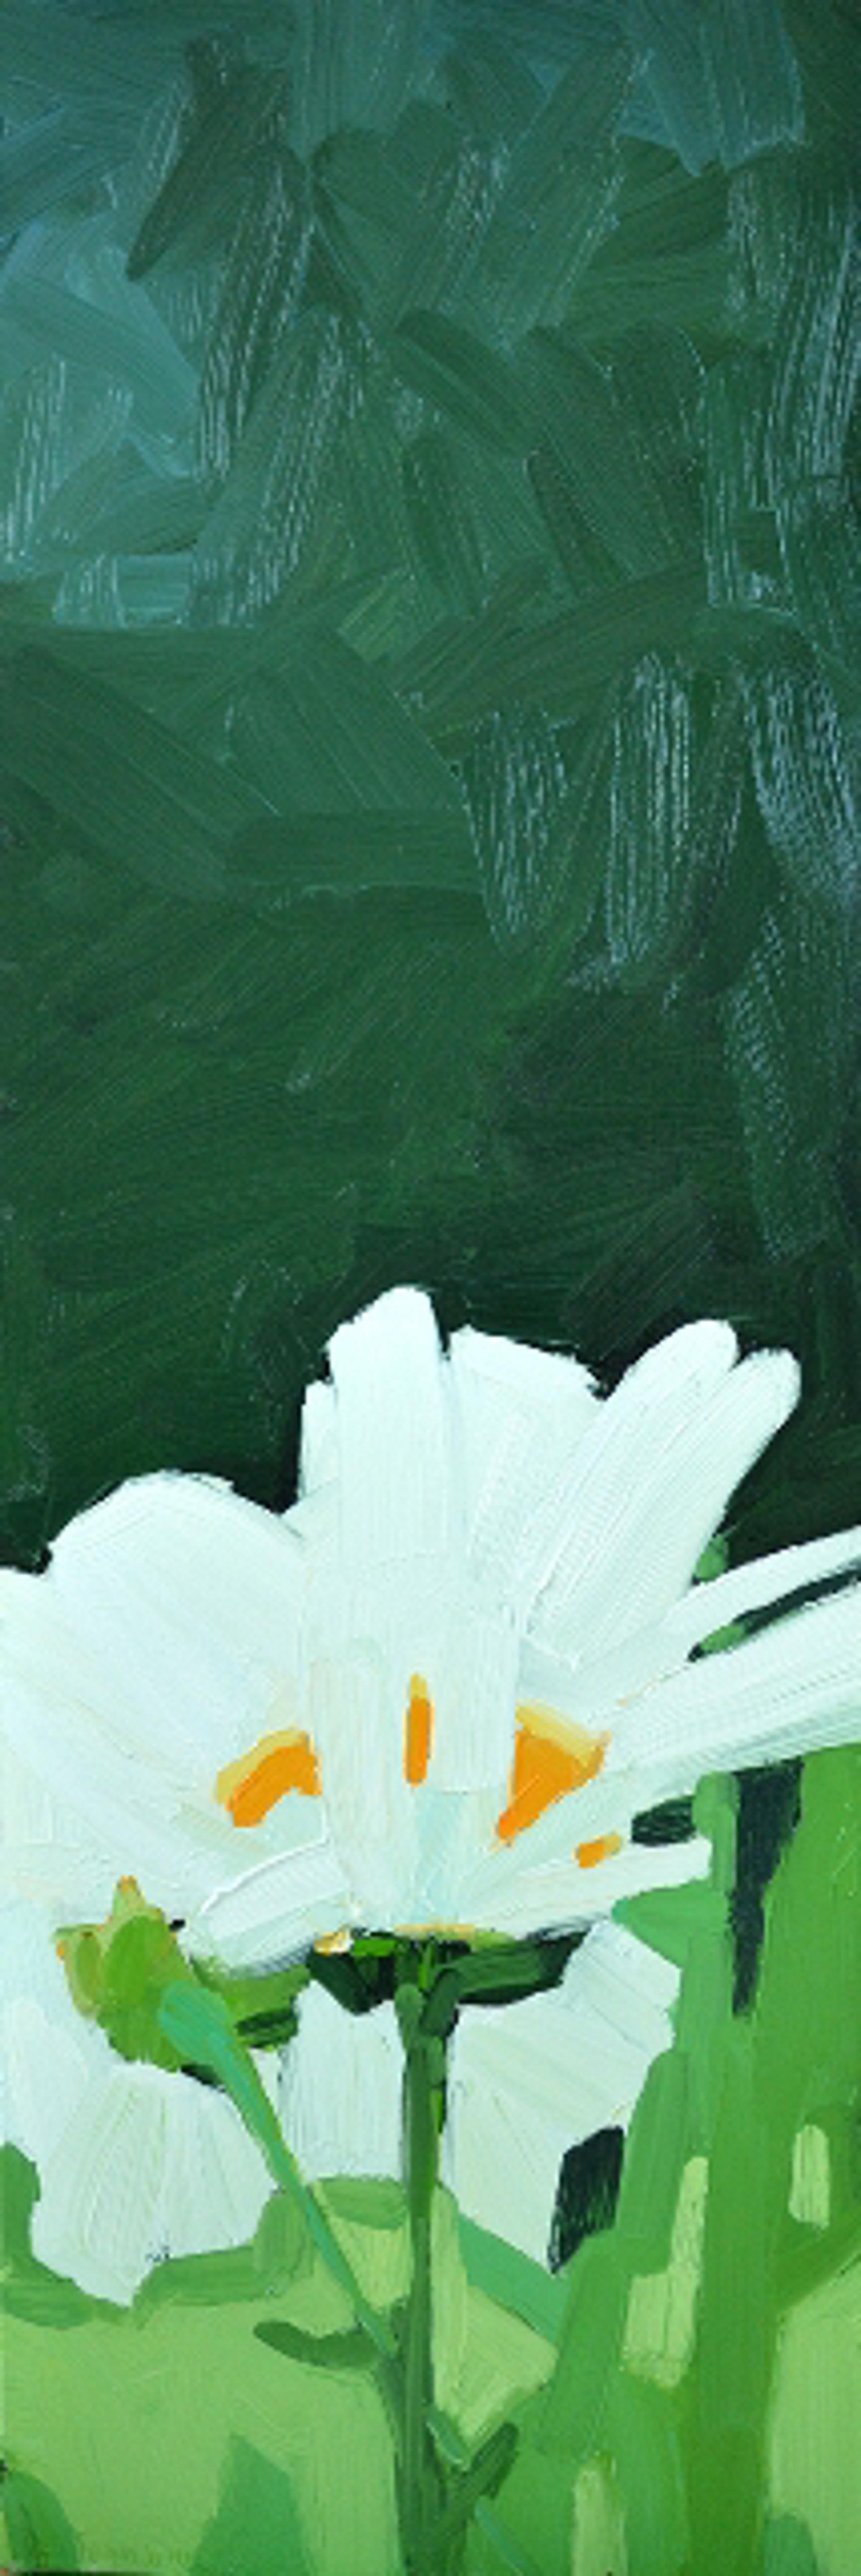 tall daisy by Krista Townsend